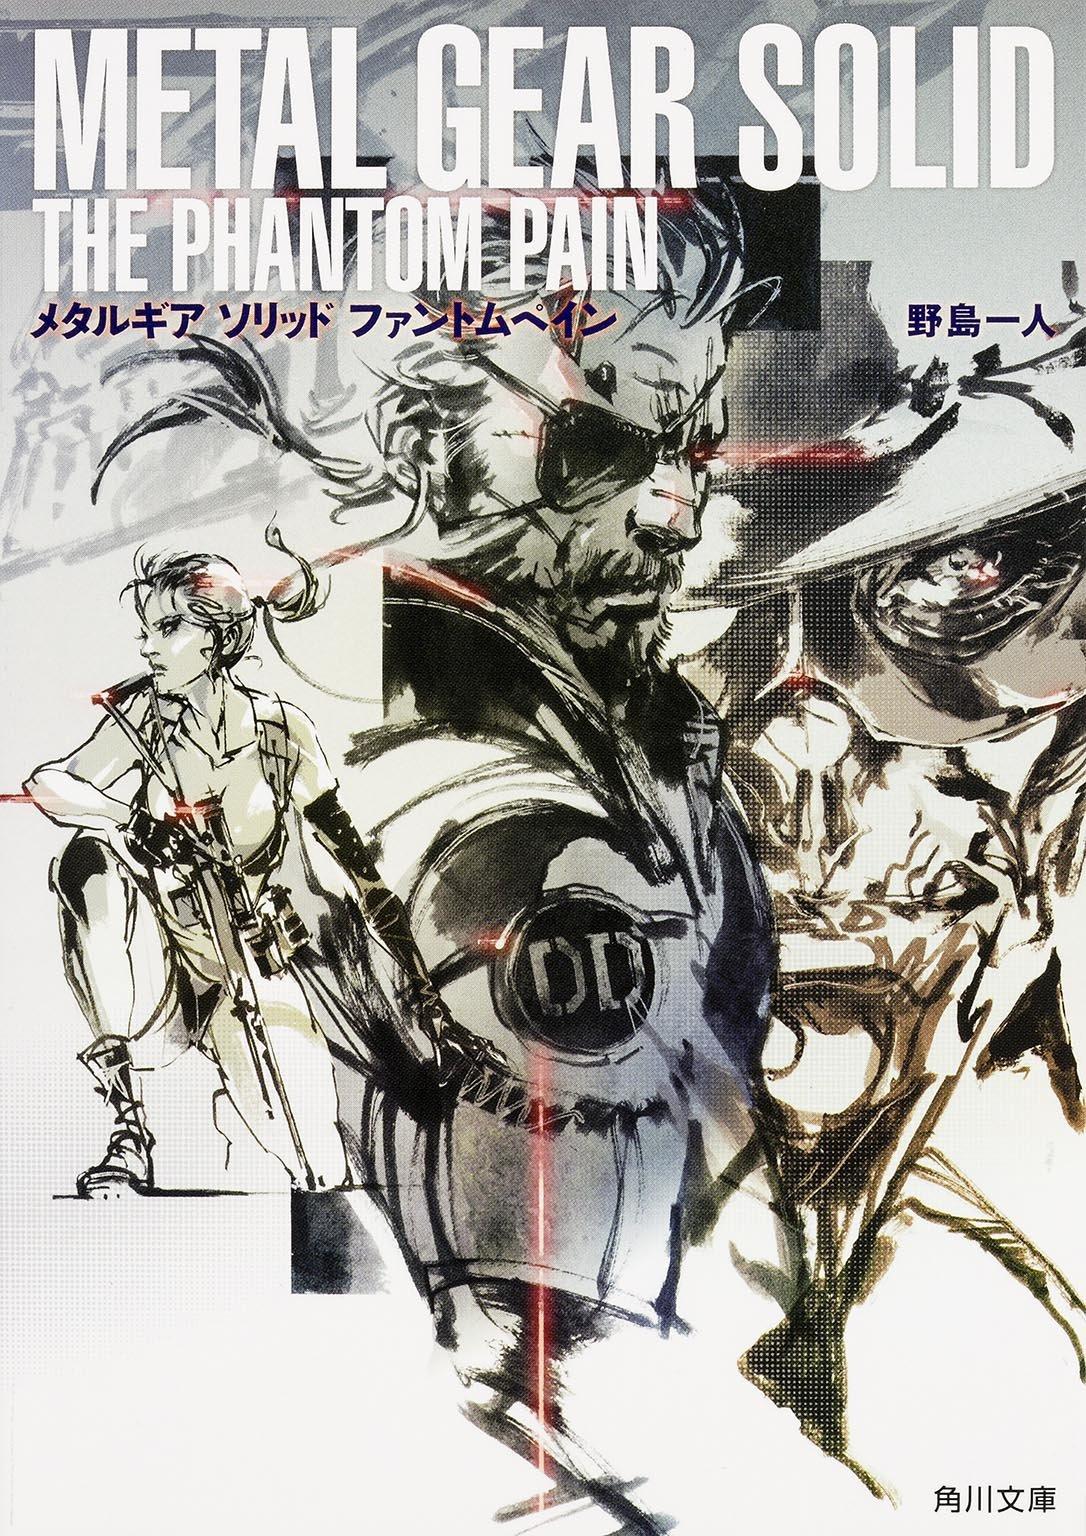 Metal Gear Solid: The Phantom Pain | メタルギア ソリッド ファントムペイン